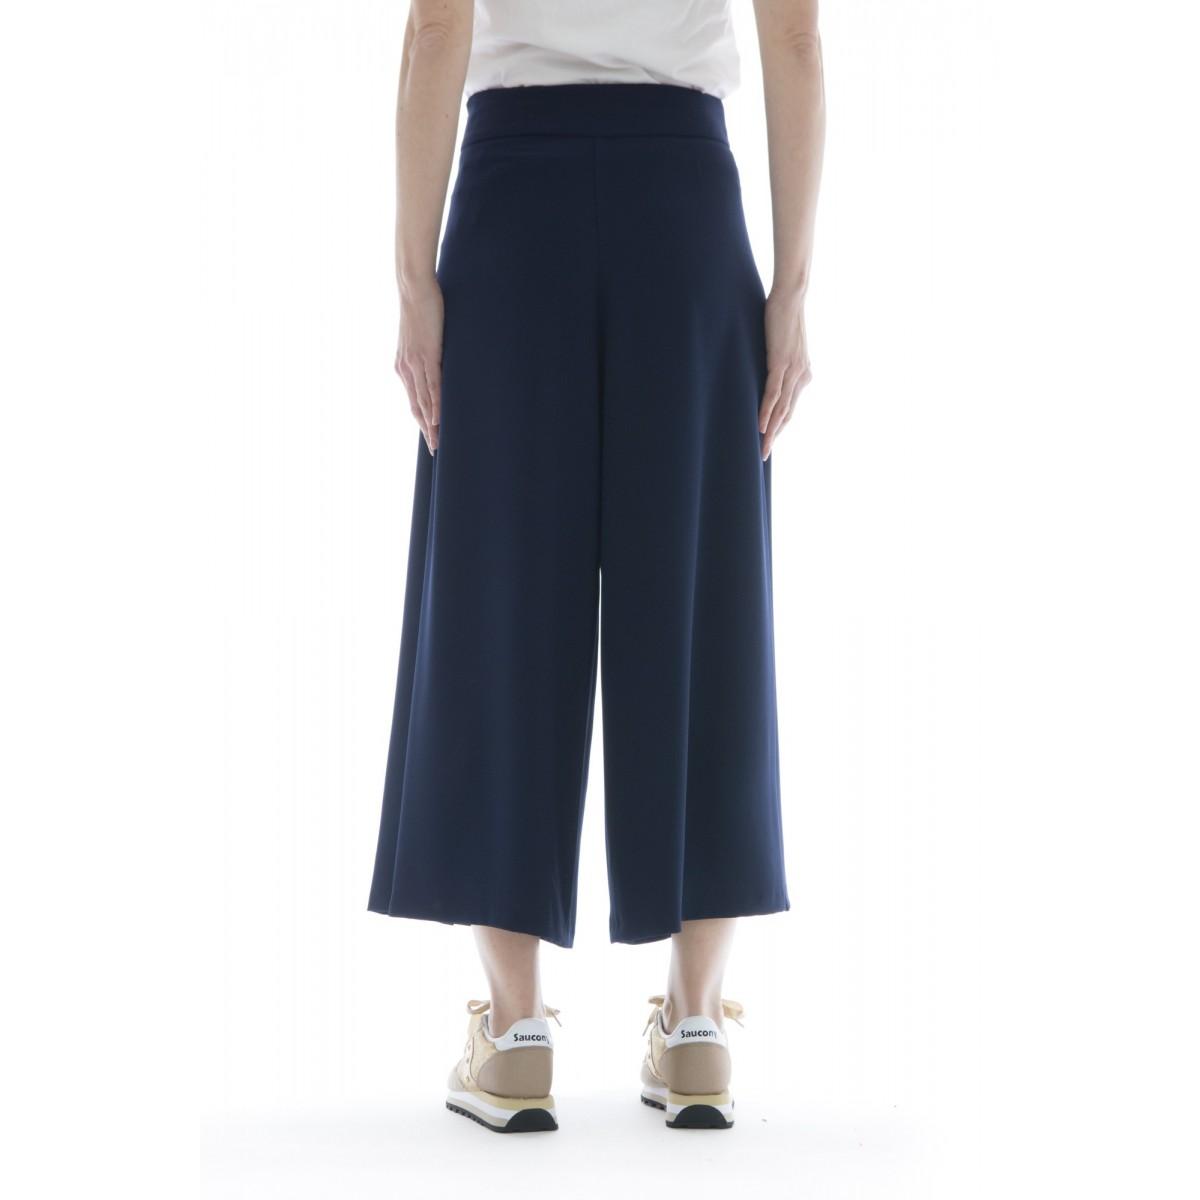 Pantalone donna - 145516 pantalone largo